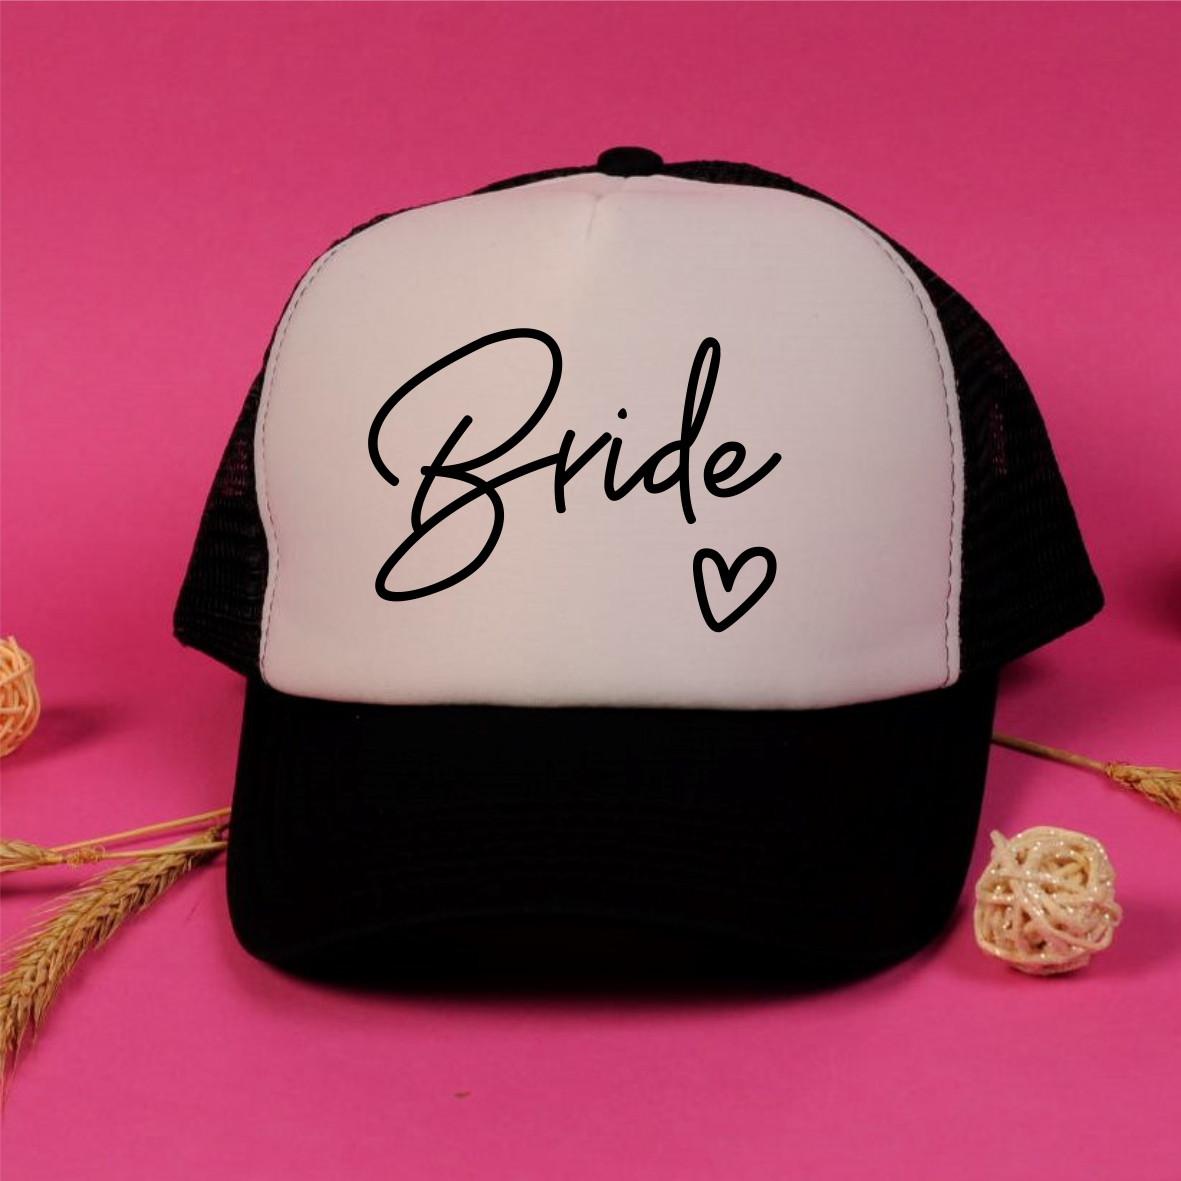 "Кепка на дівич-вечір для нареченої і подружок  ""Bride +Bride team"""